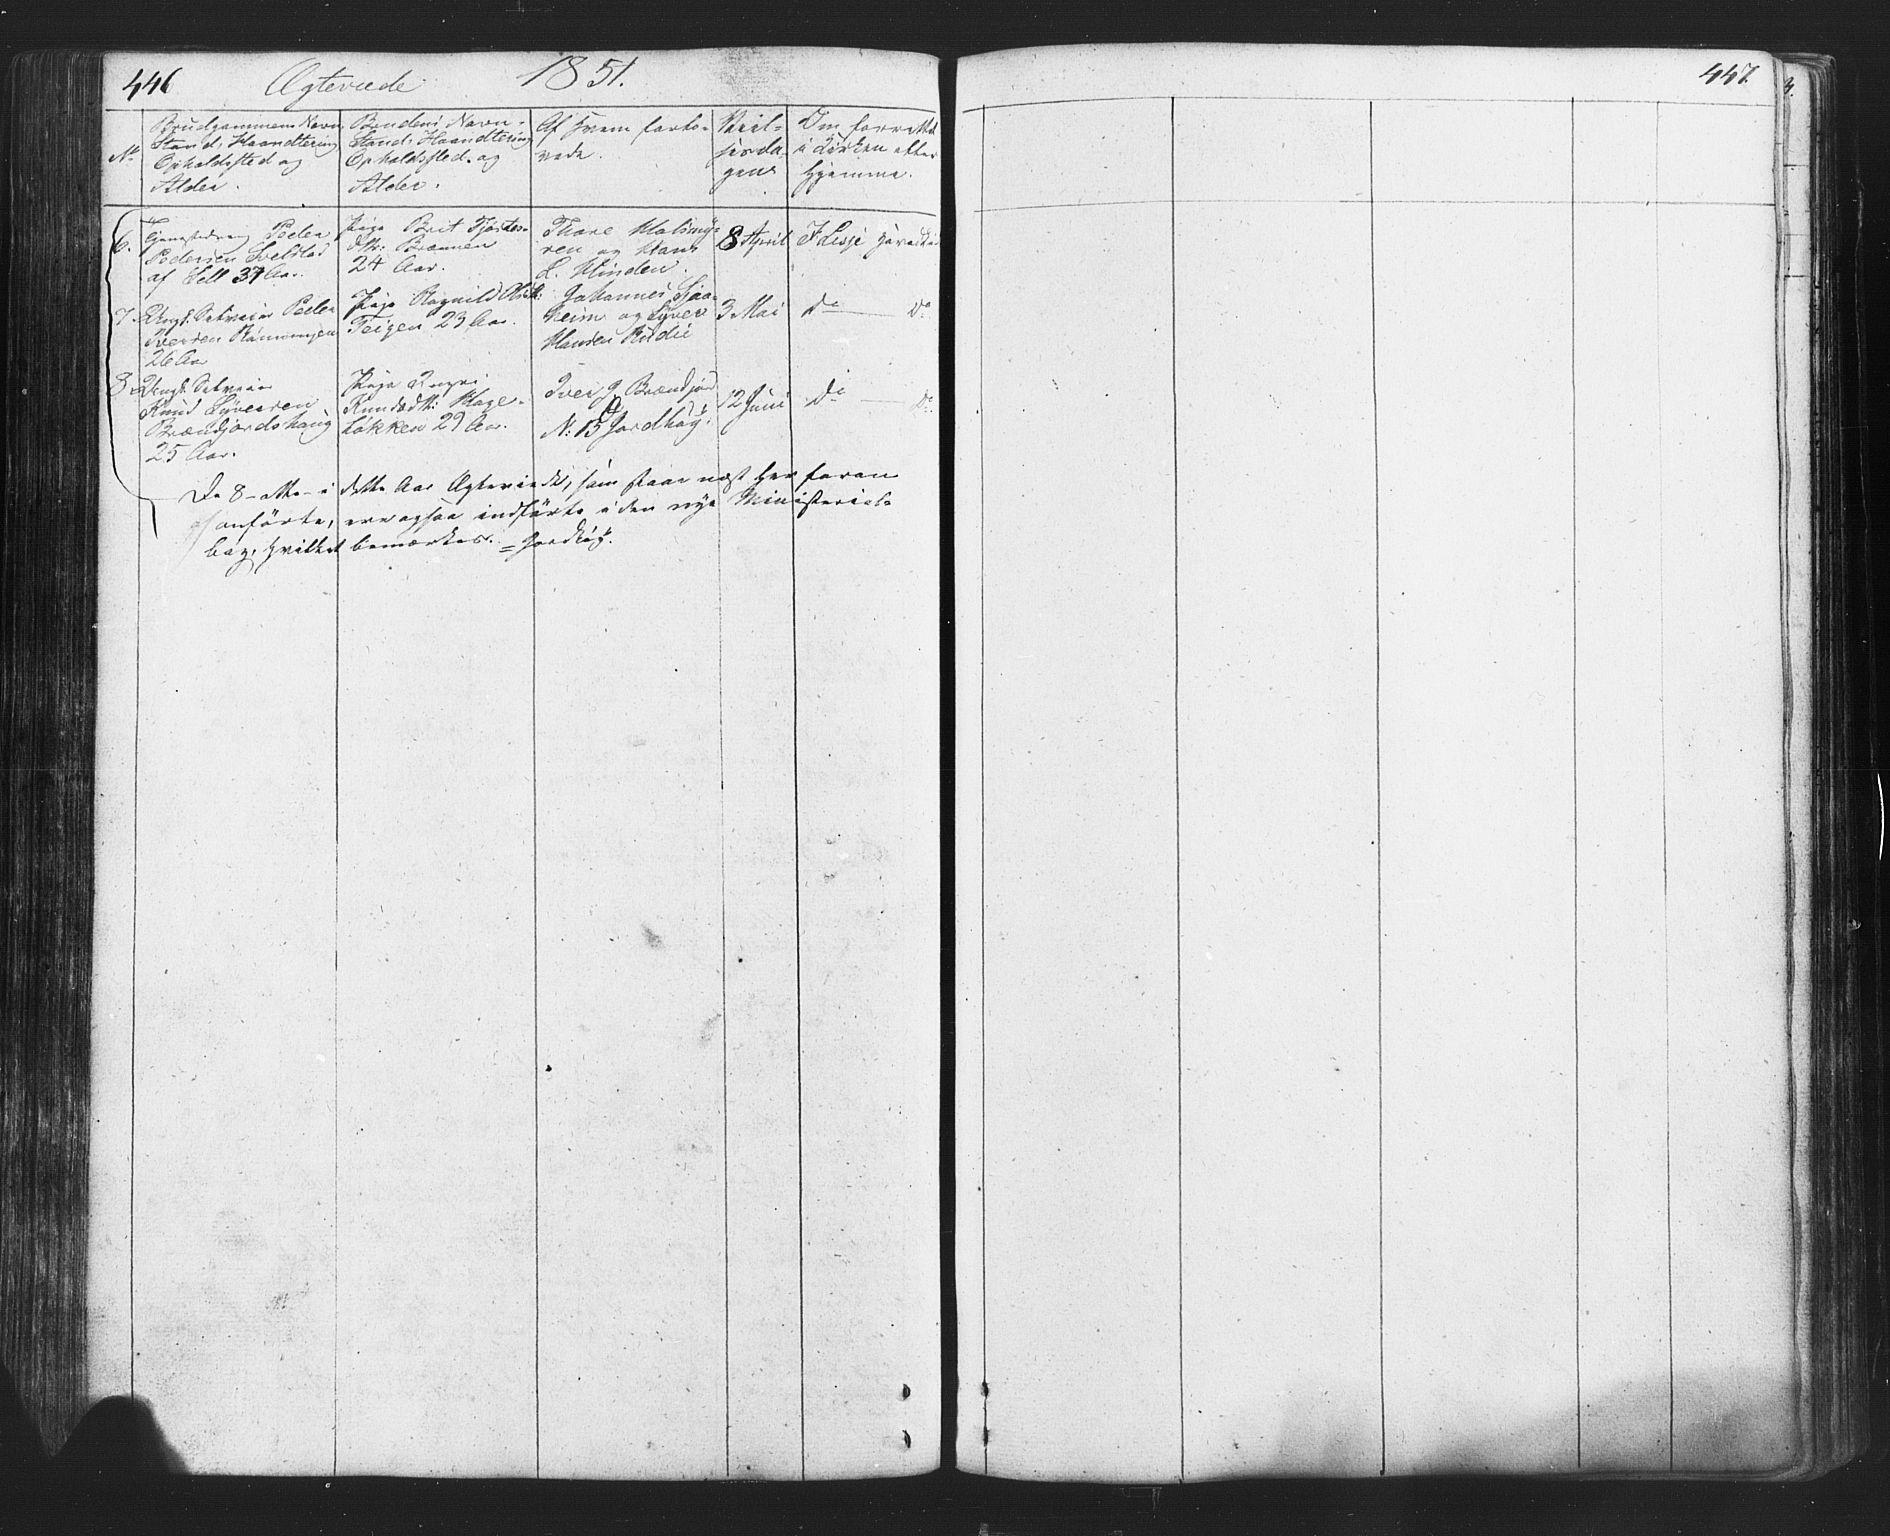 SAH, Lesja prestekontor, Klokkerbok nr. 2, 1832-1850, s. 446-447